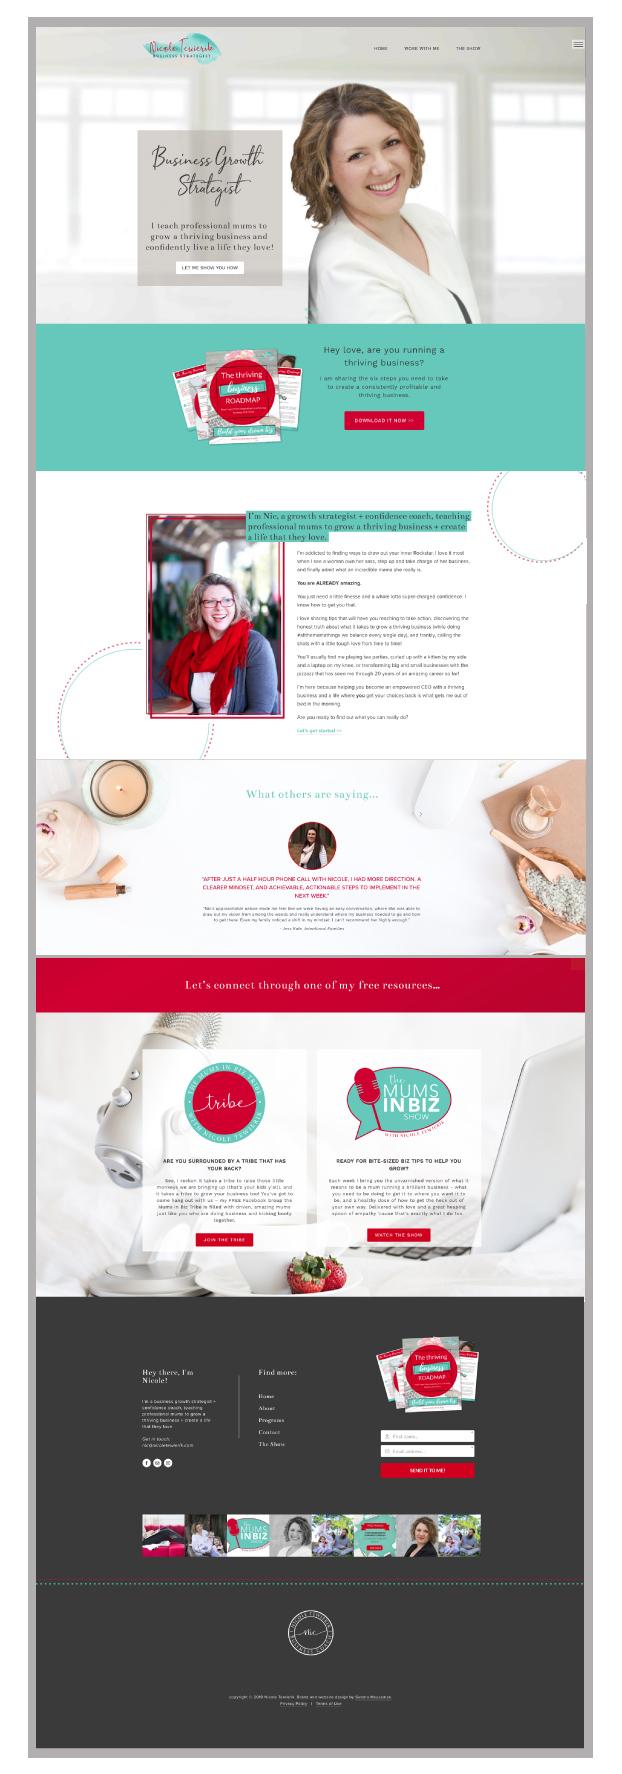 WEB-Nicole-HomePage-RecentWork-Image1.jpg